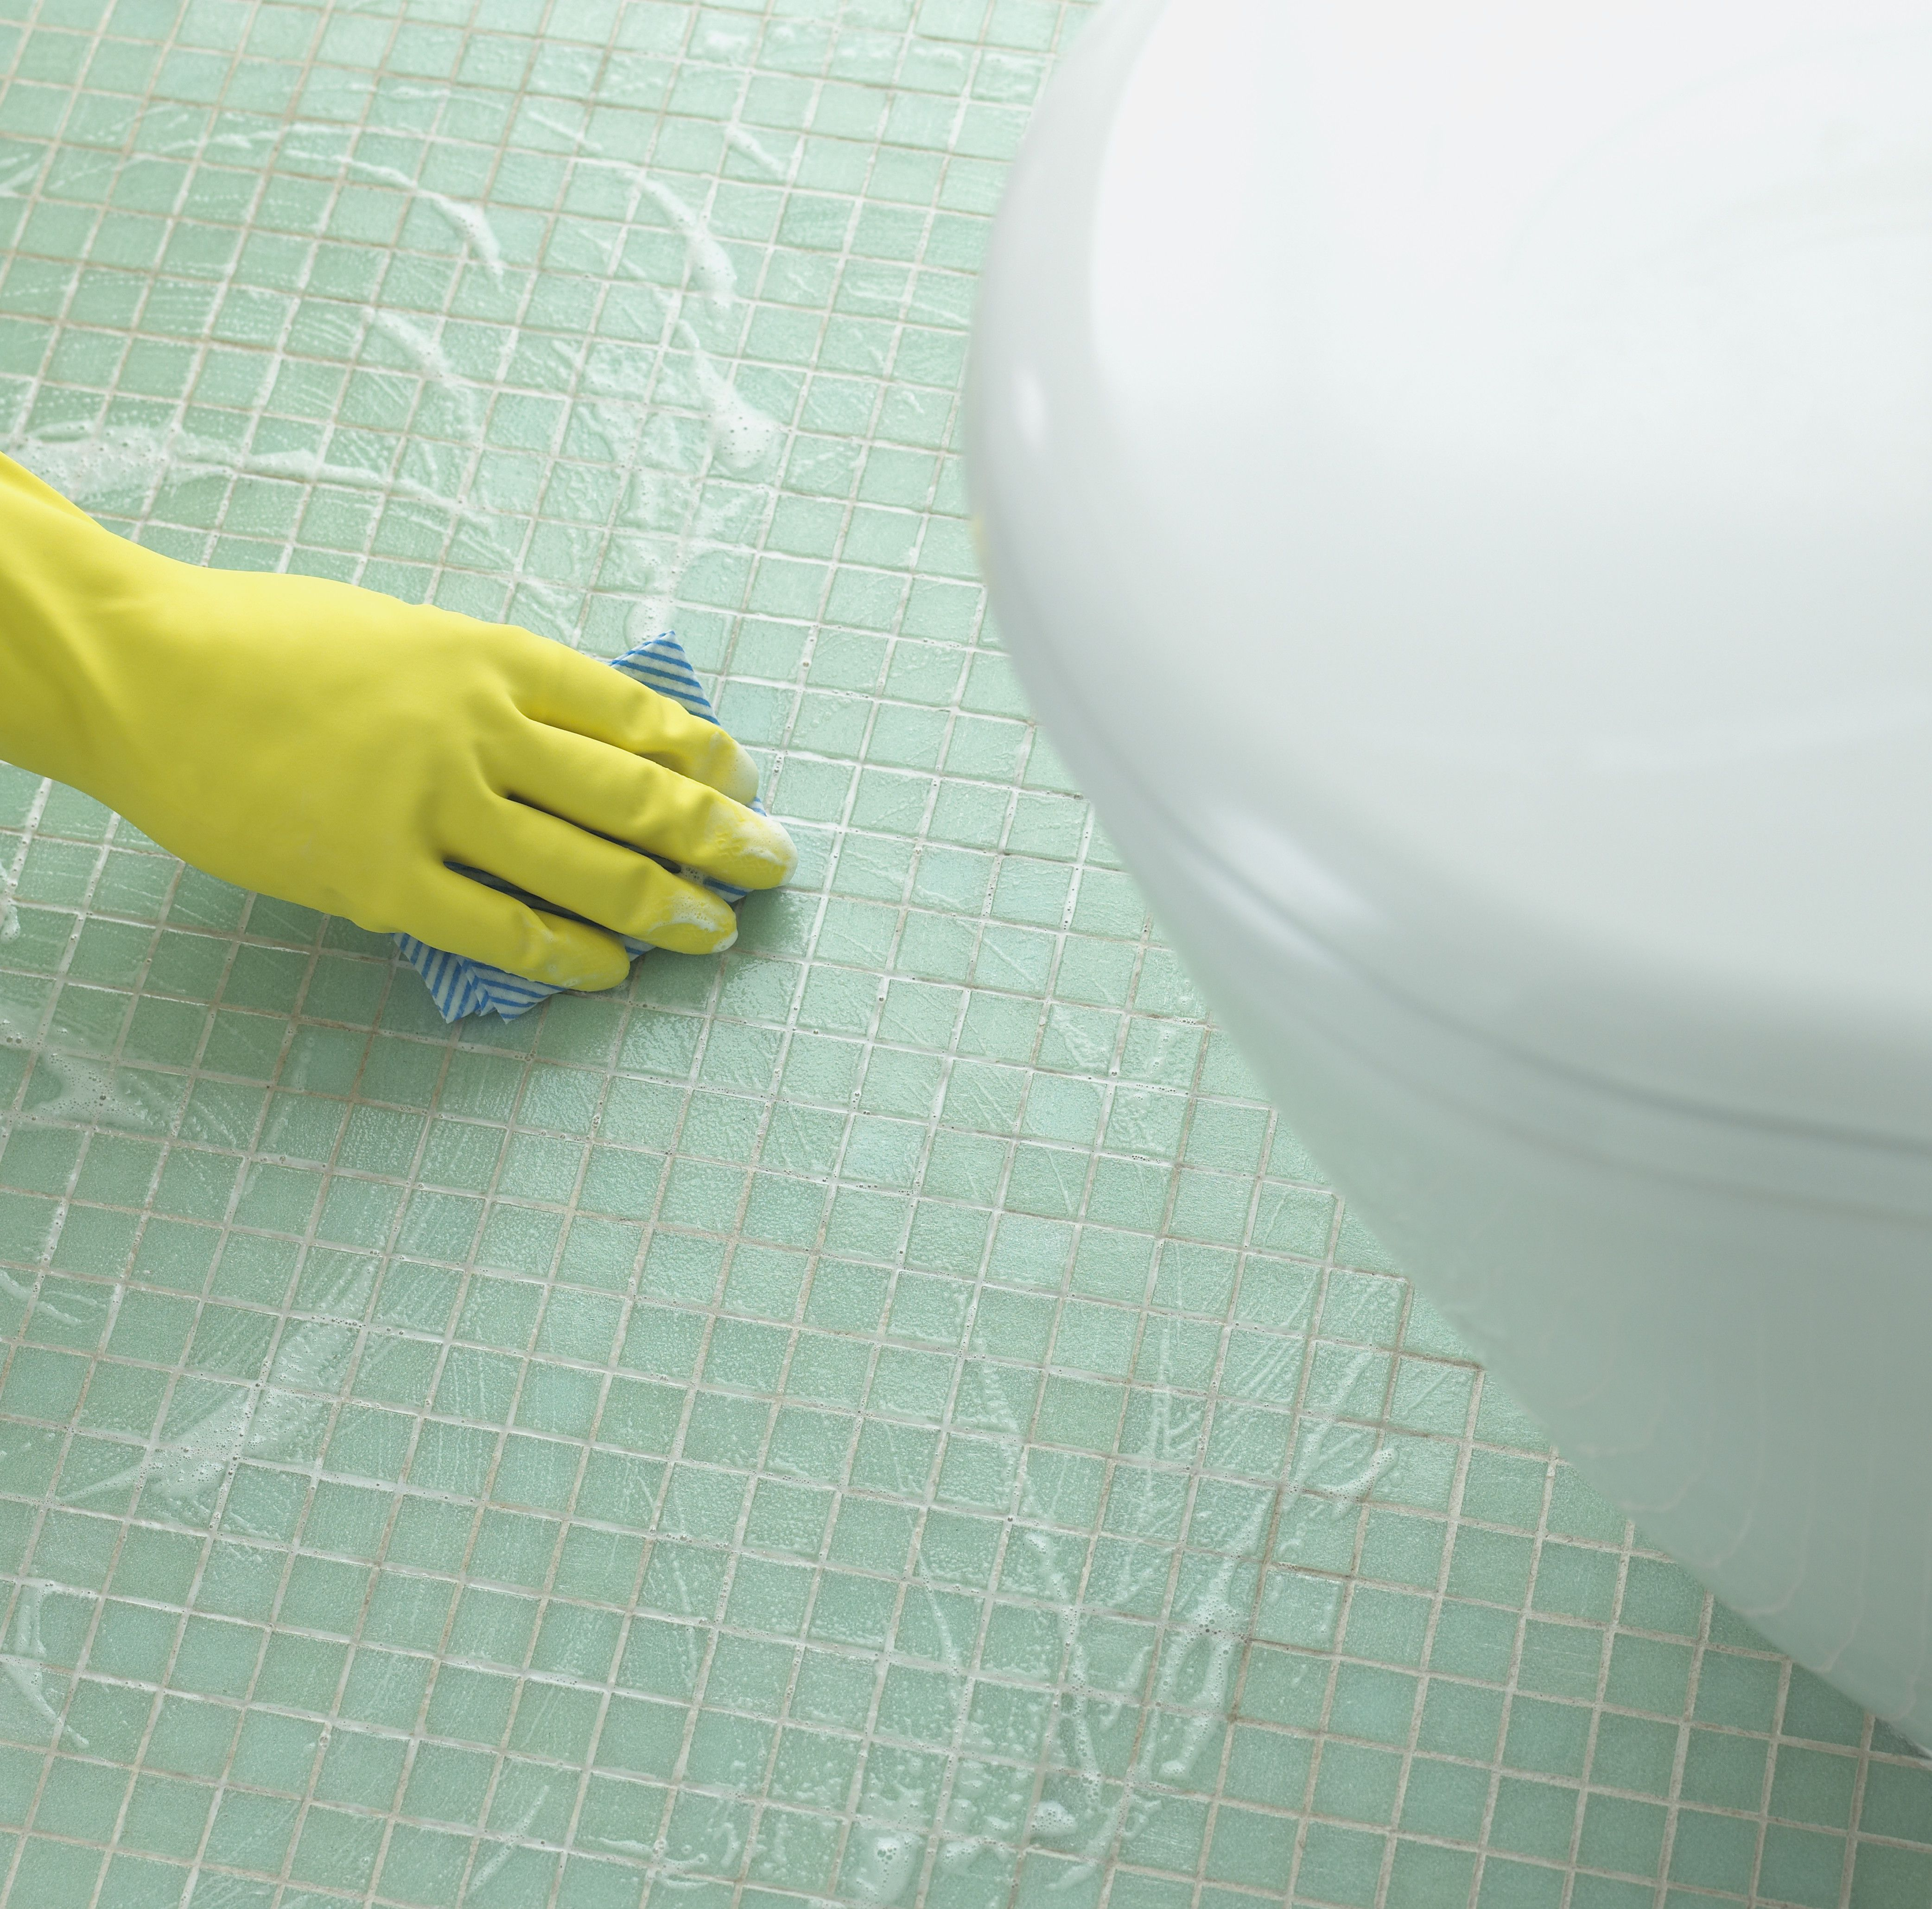 How to fix a leaky toilet base doublecrazyfo Images